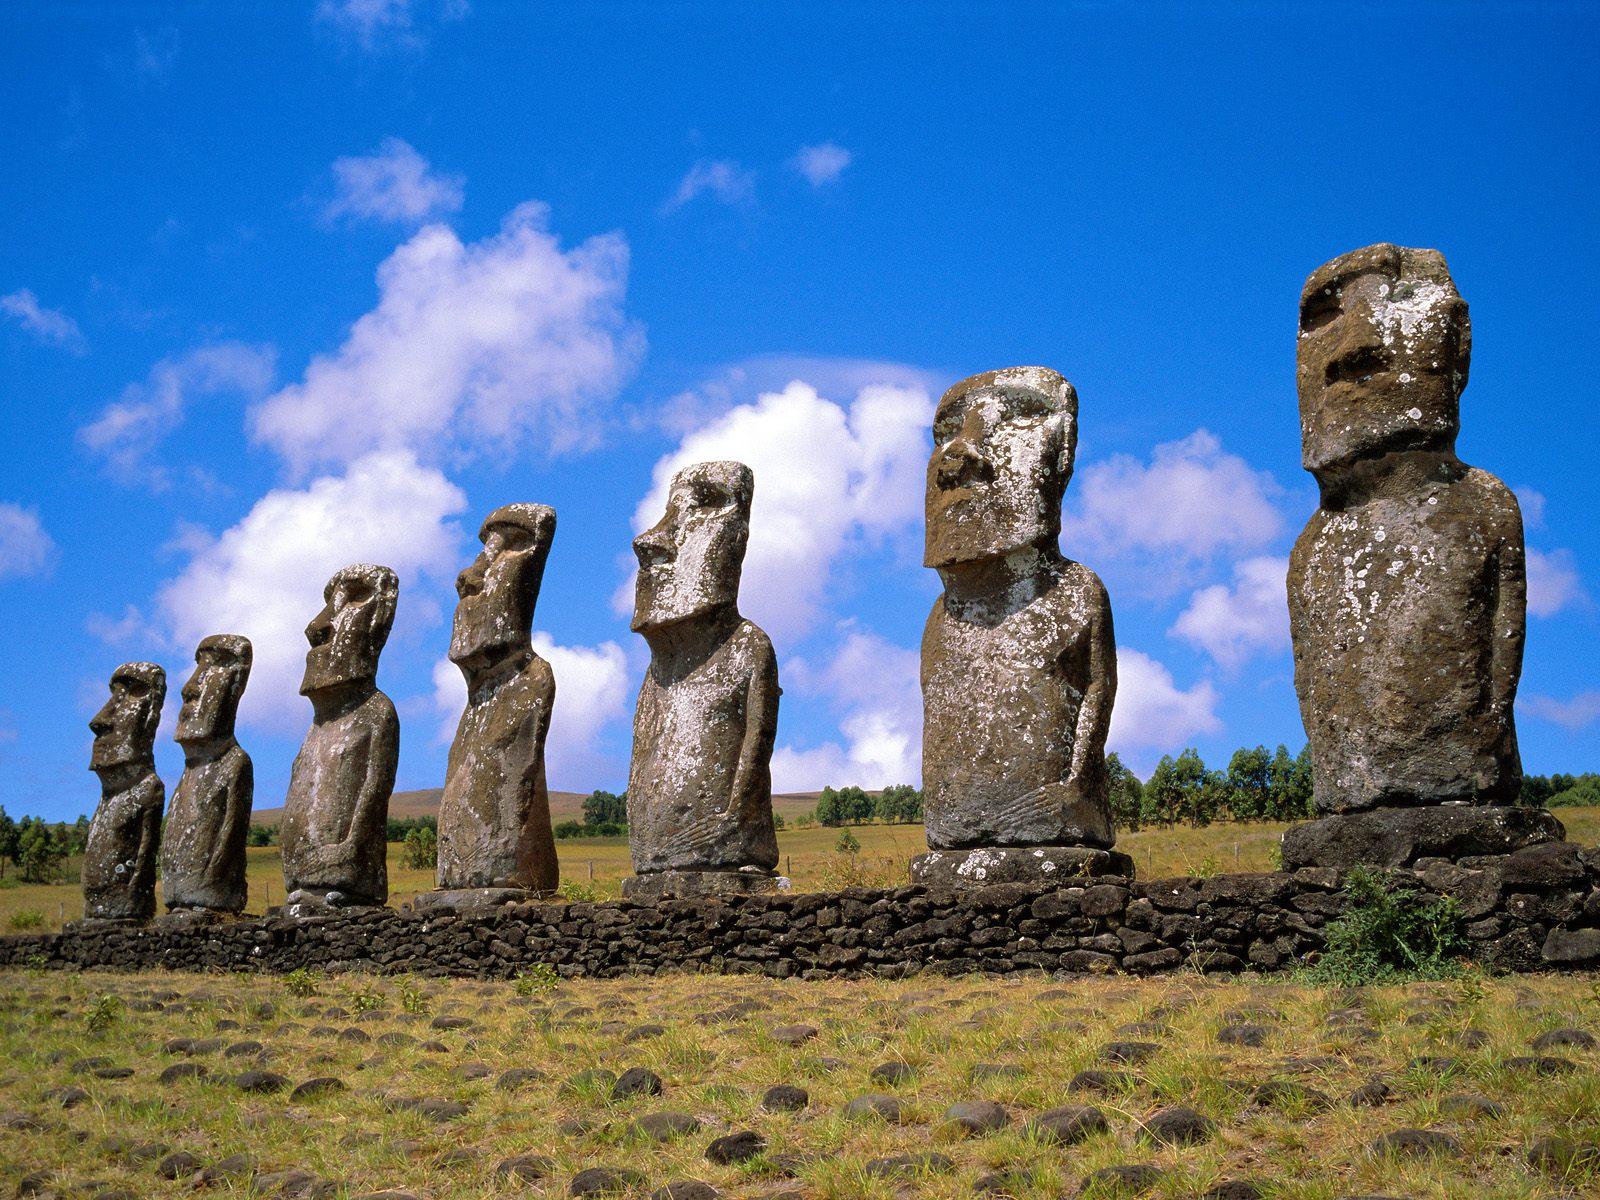 Construction Humaine - Moai  Chili Easter Island Fond d'écran